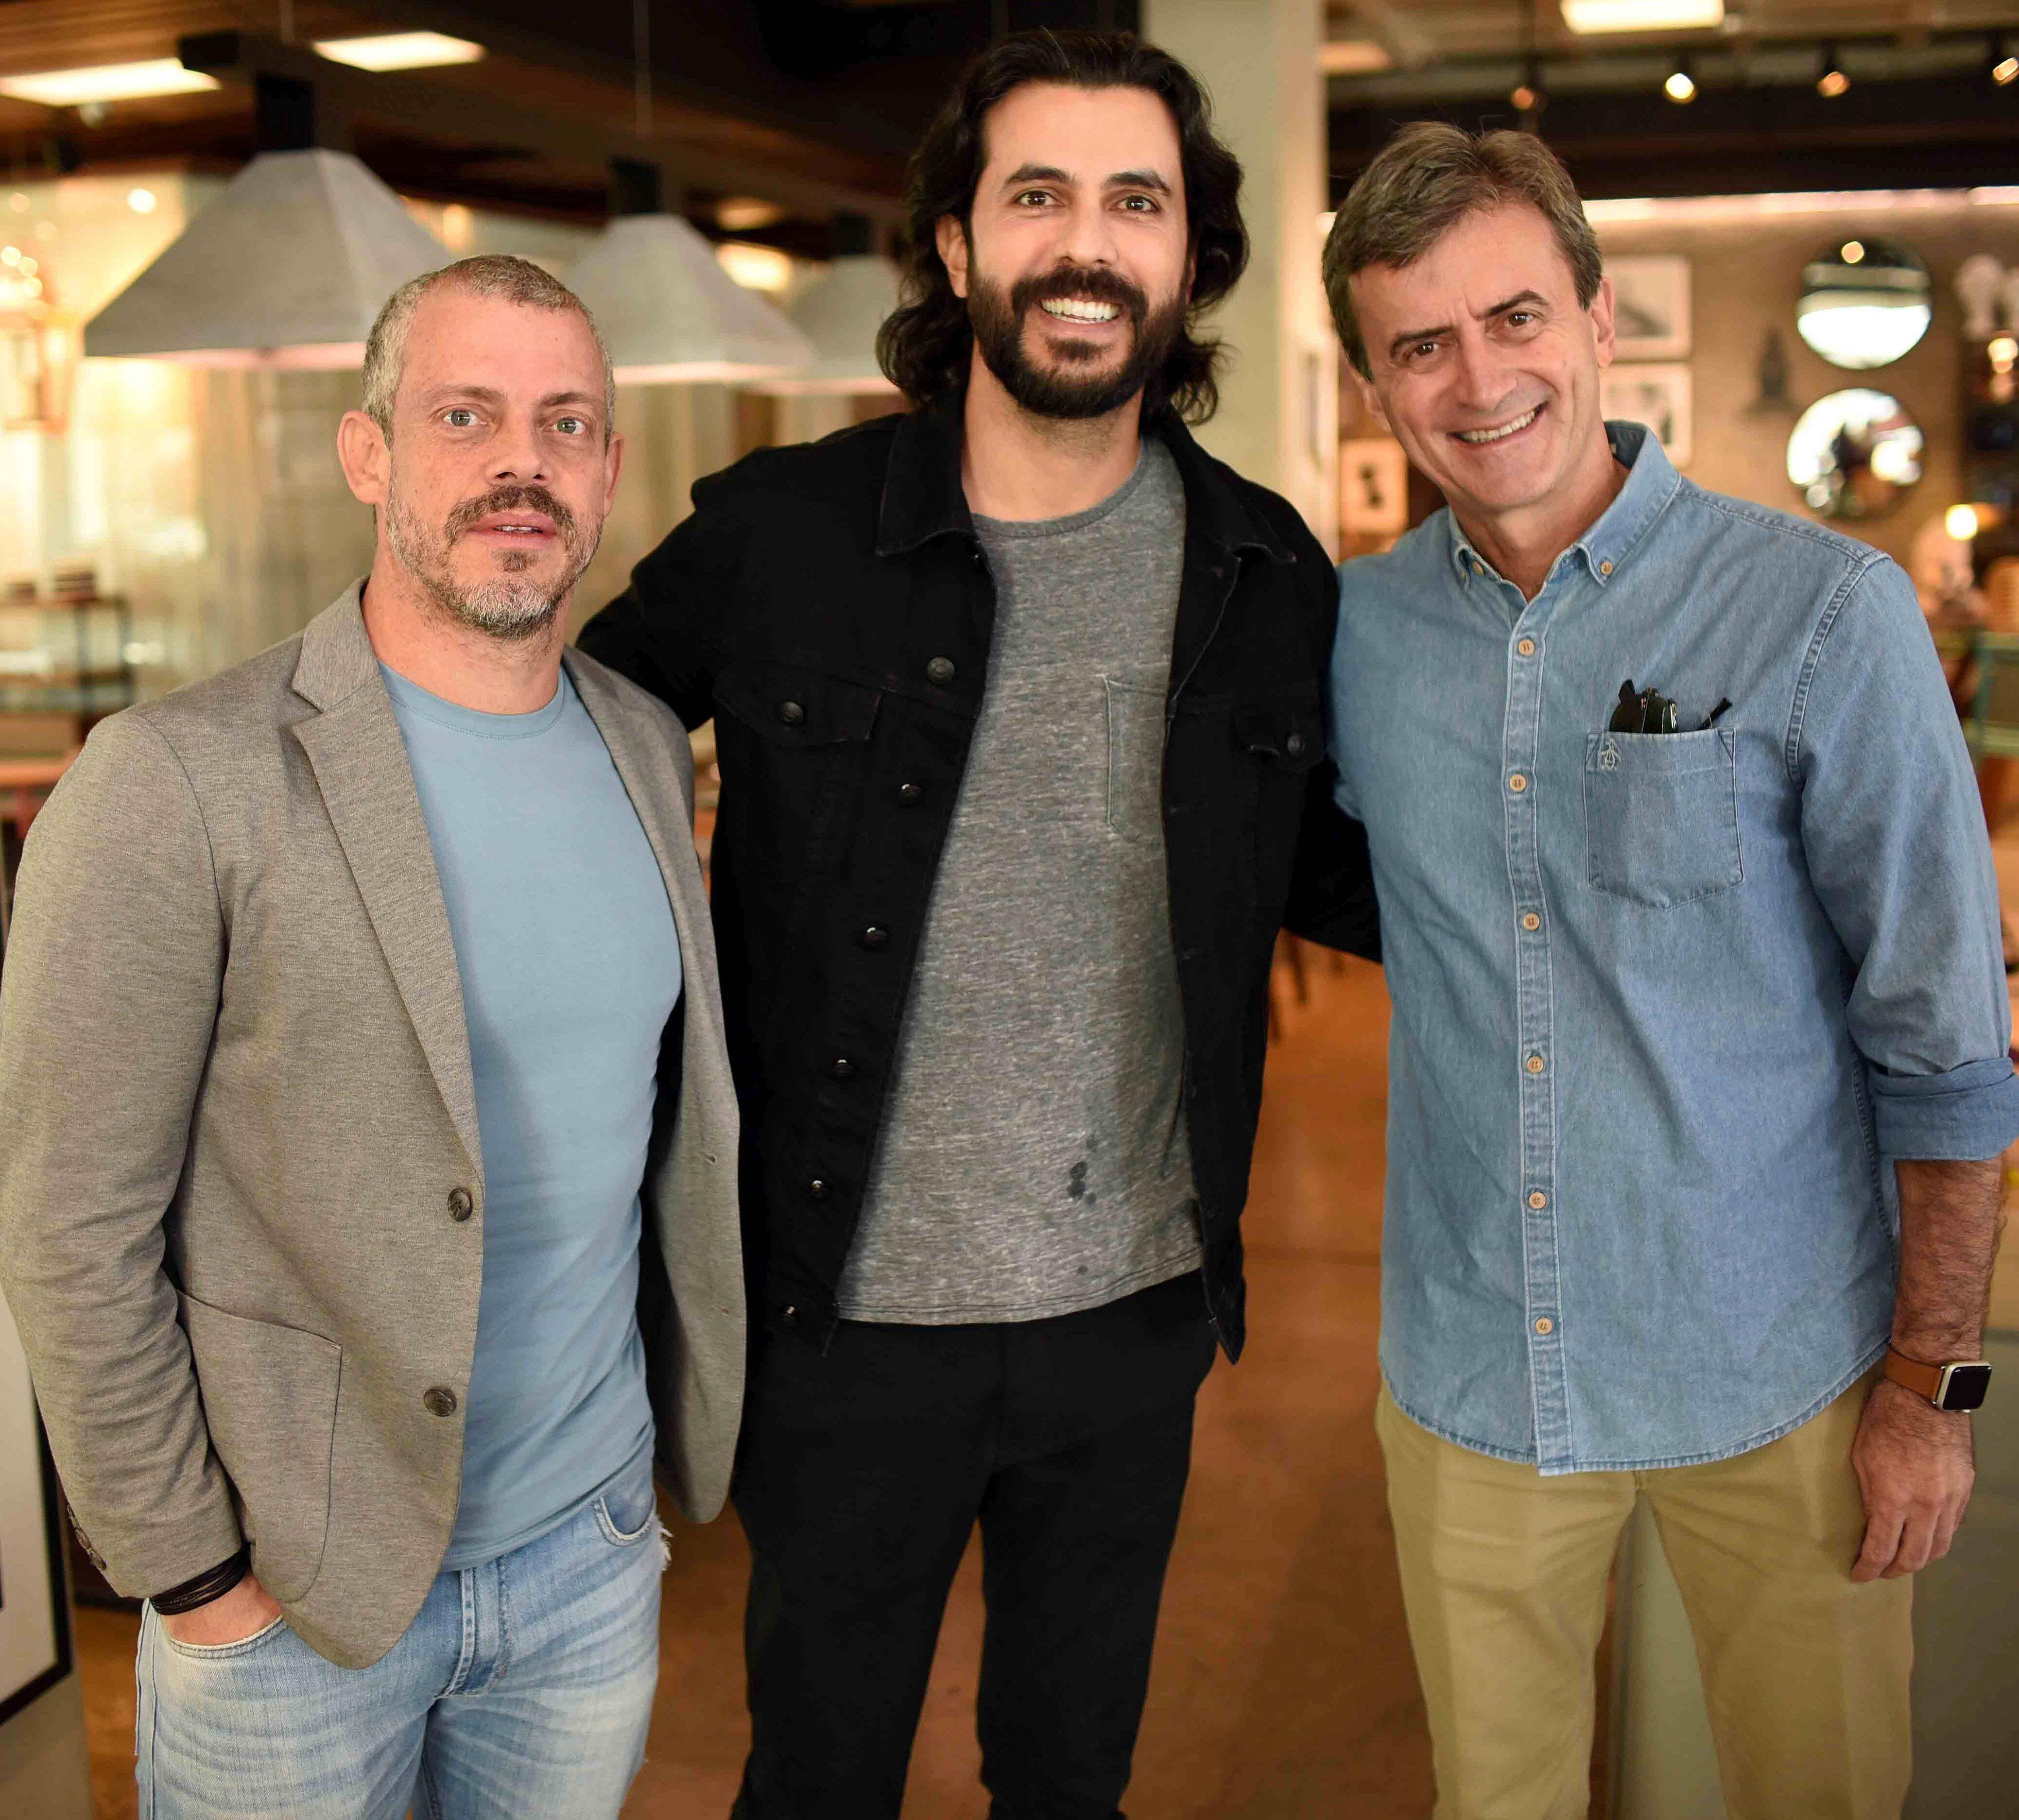 Hugo Schwartz, Artur Fernandes e Juarez Farias  / Foto: Ari Kaye